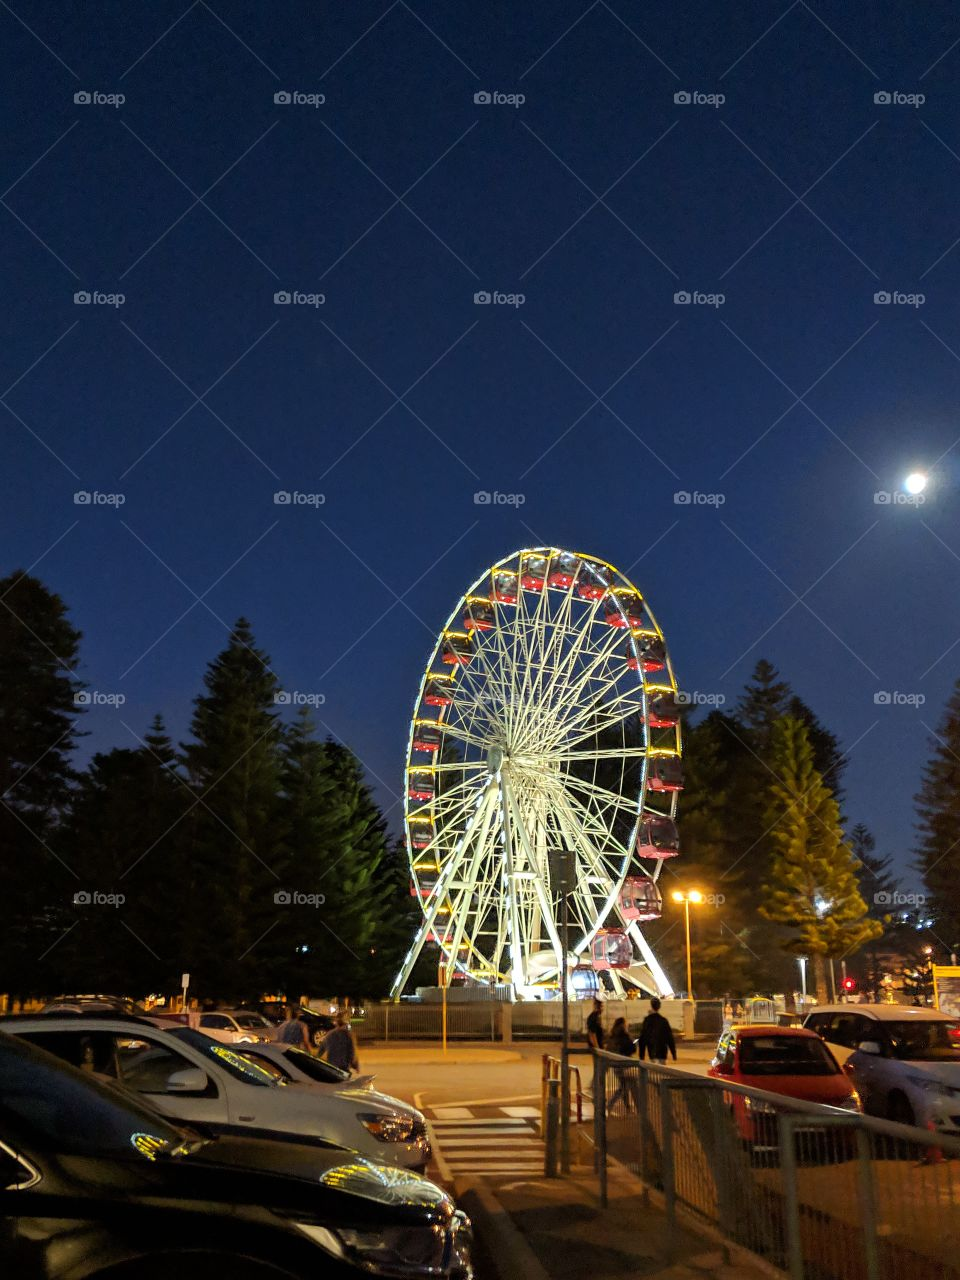 Ferris wheel under the night sky